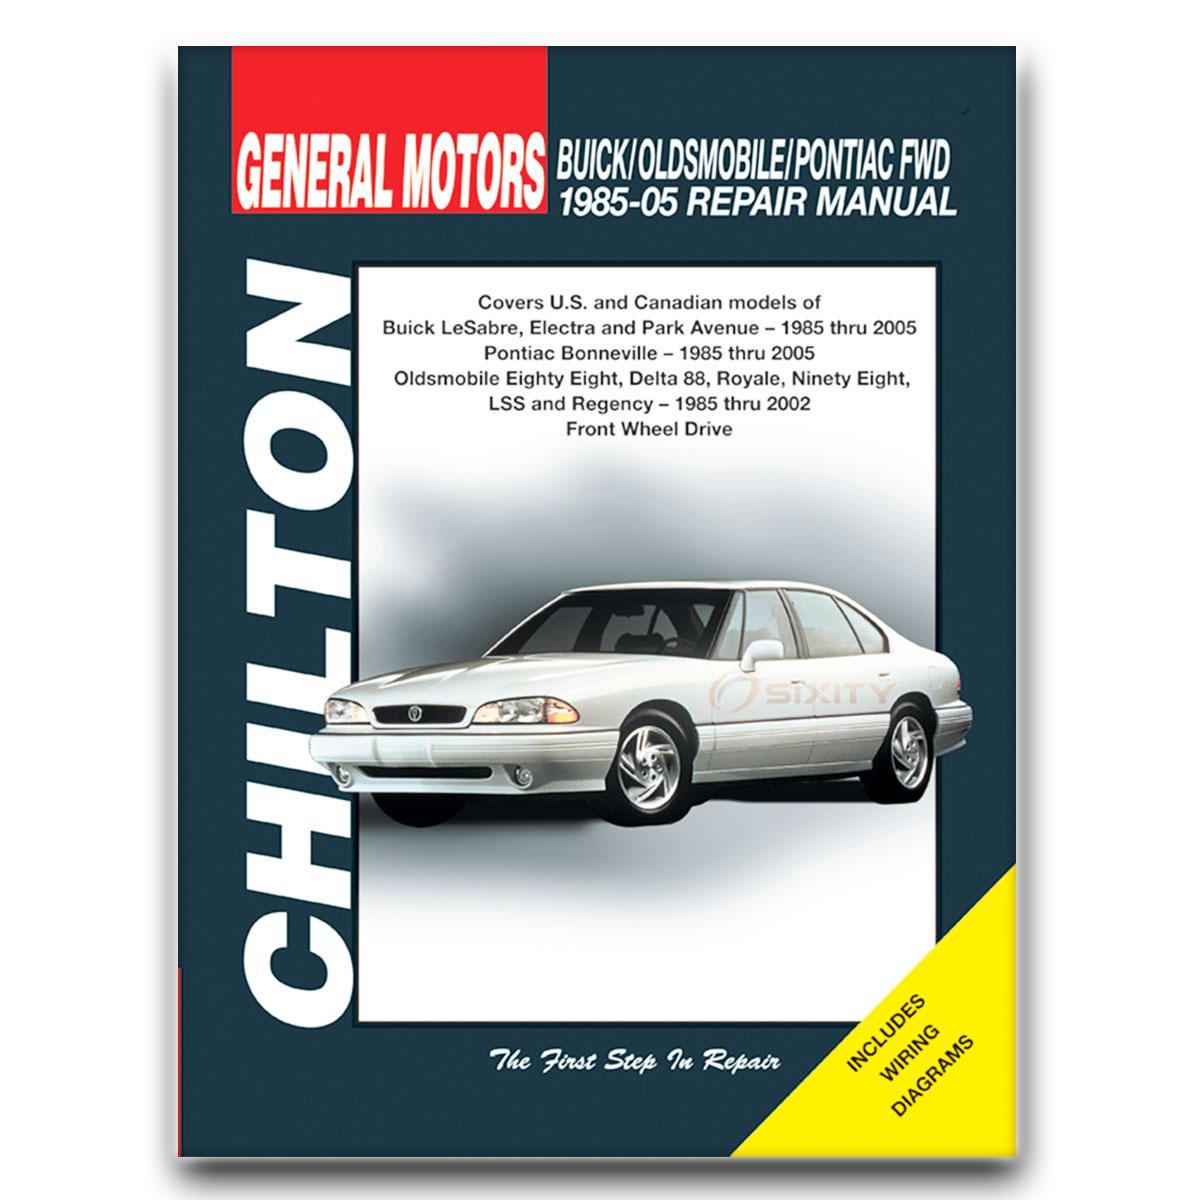 kelley blue book used car value ebay autos post. Black Bedroom Furniture Sets. Home Design Ideas